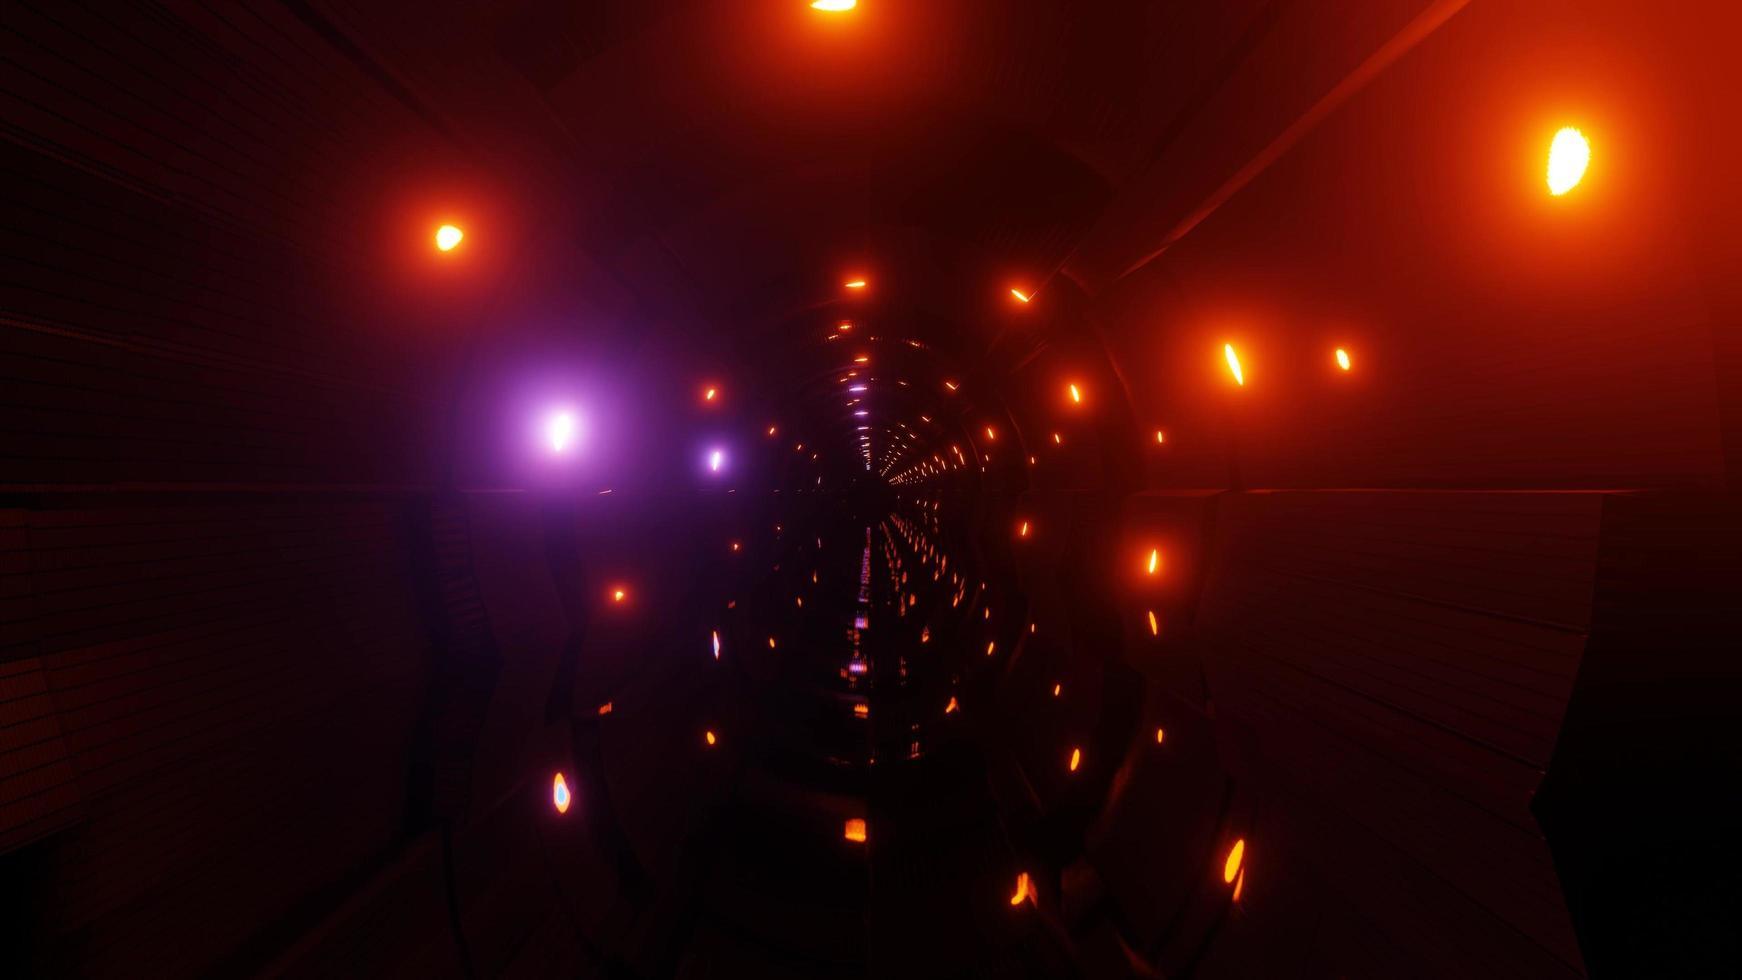 bewegende lichten op sci fi tunnel 3d illustratie foto